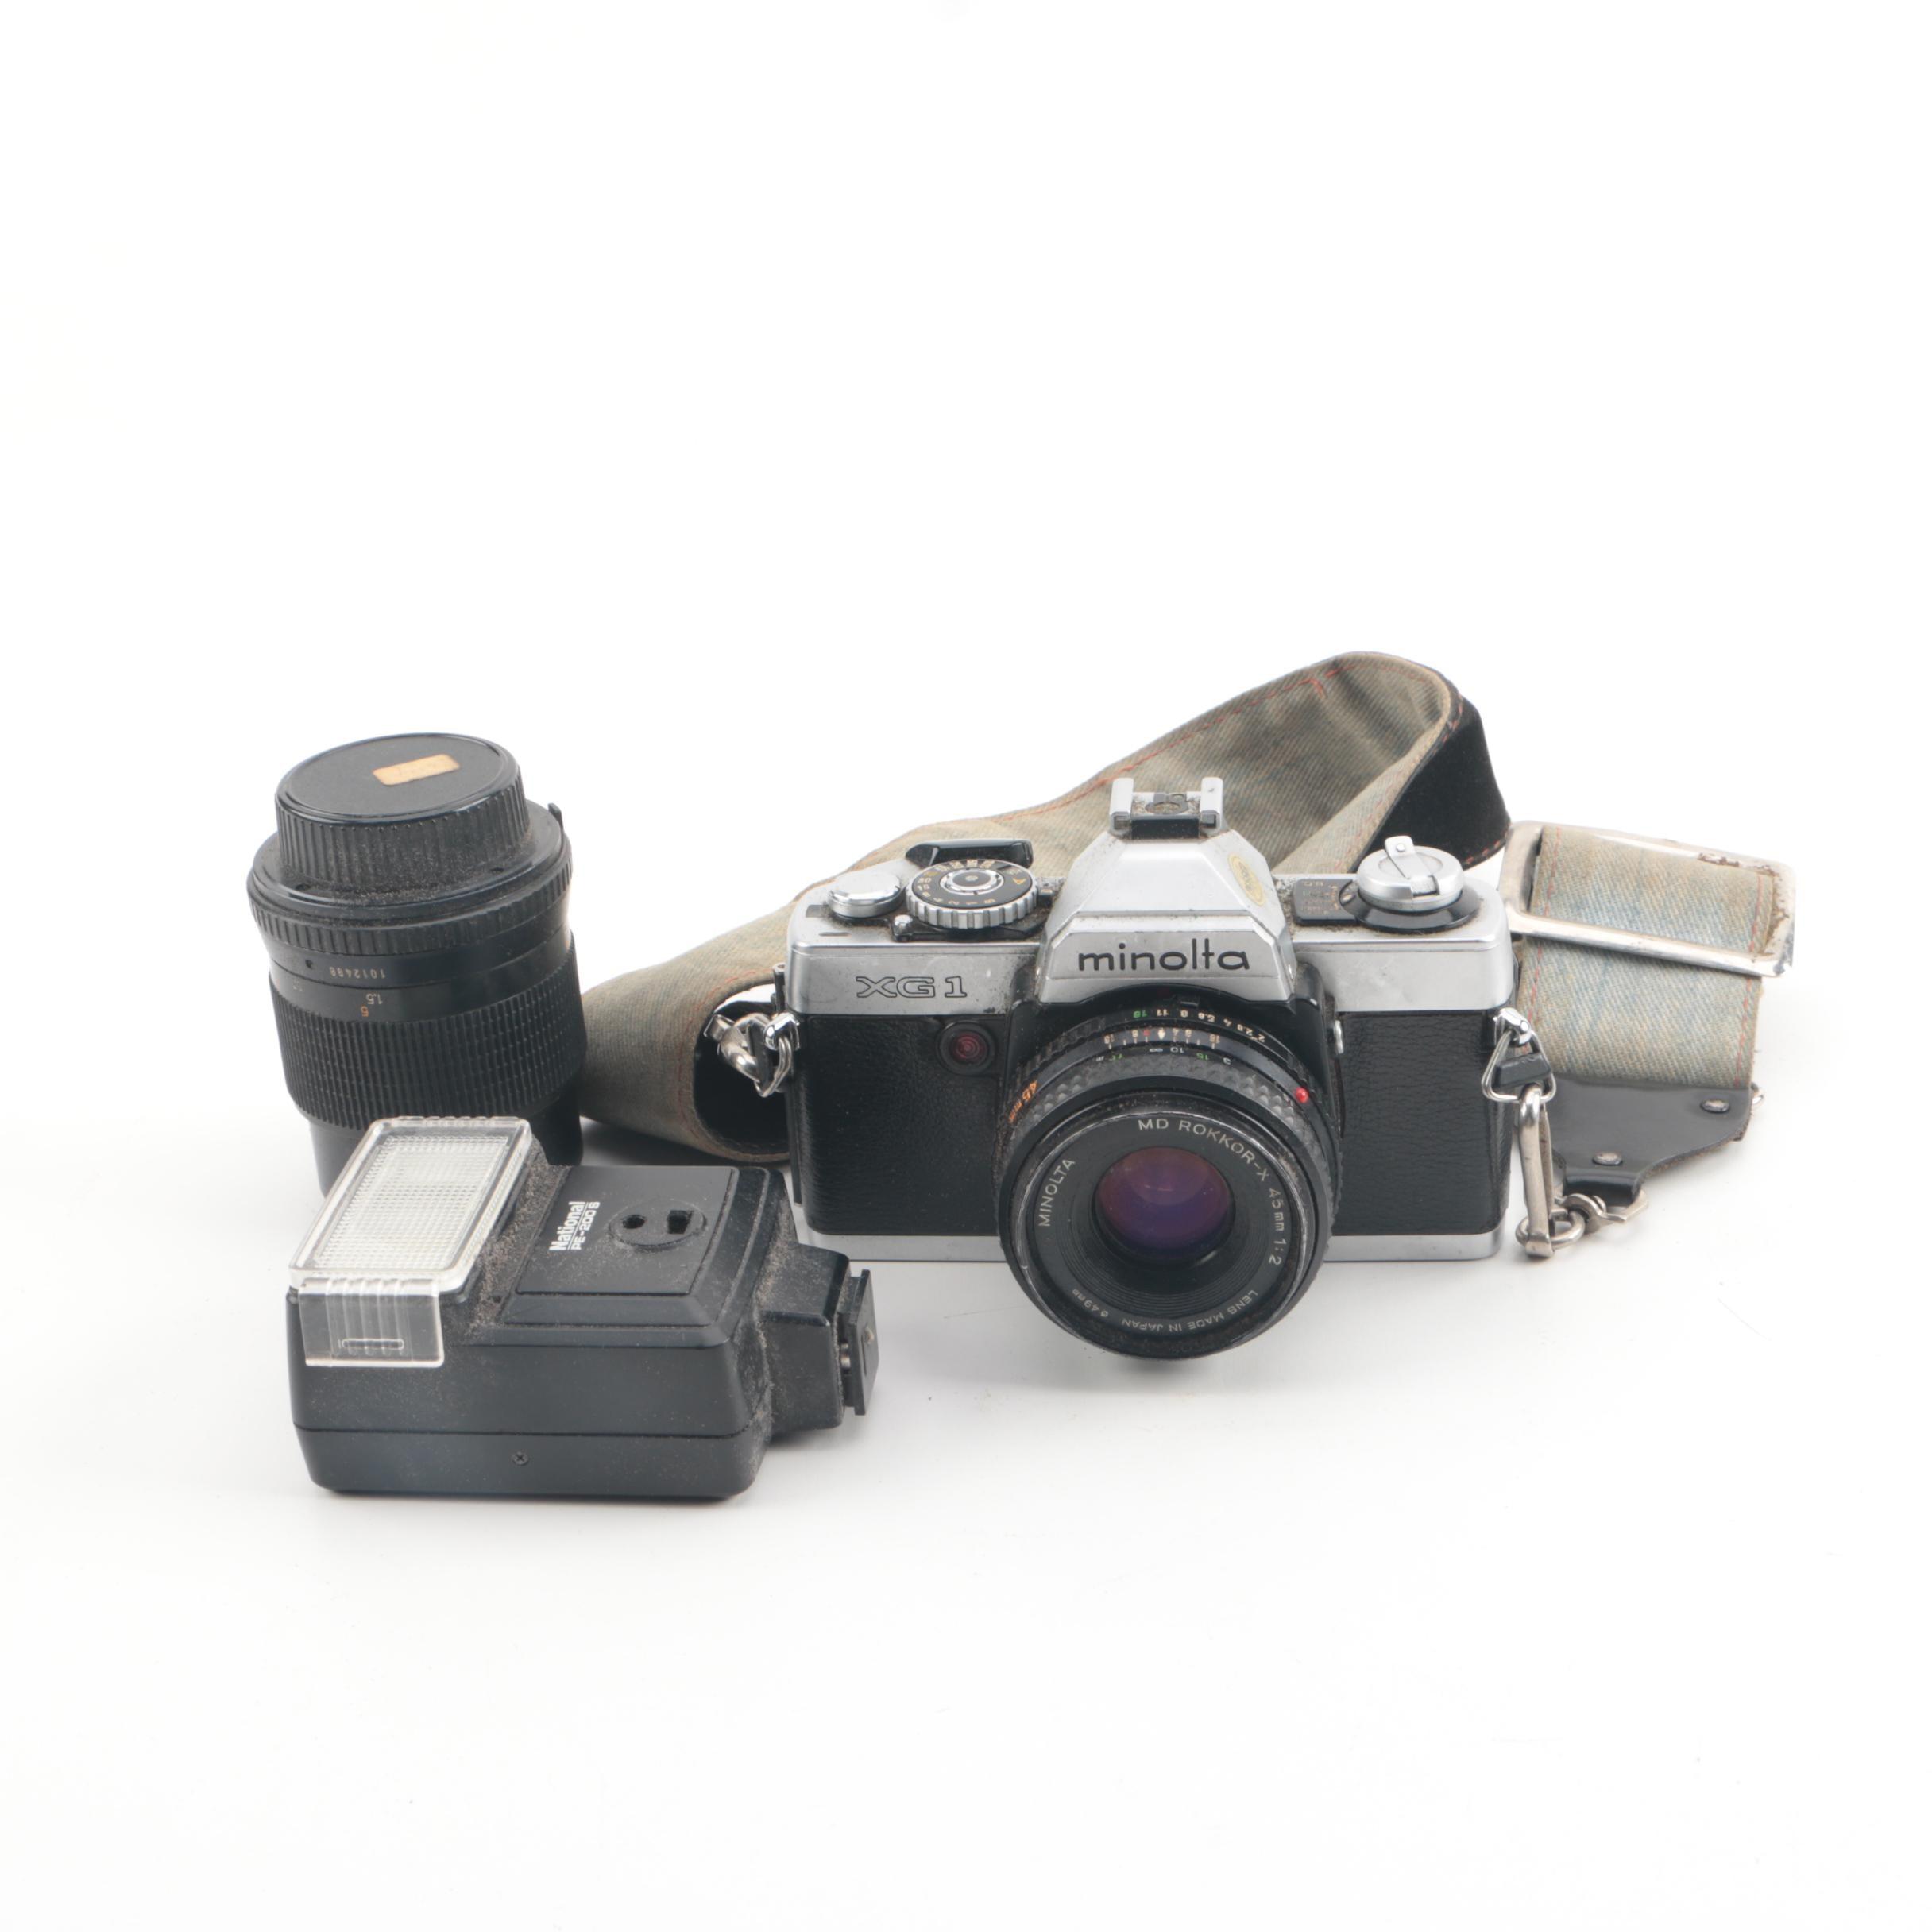 Vintage Minolta XG 1 35mm SLR Camera with Flash and Lens